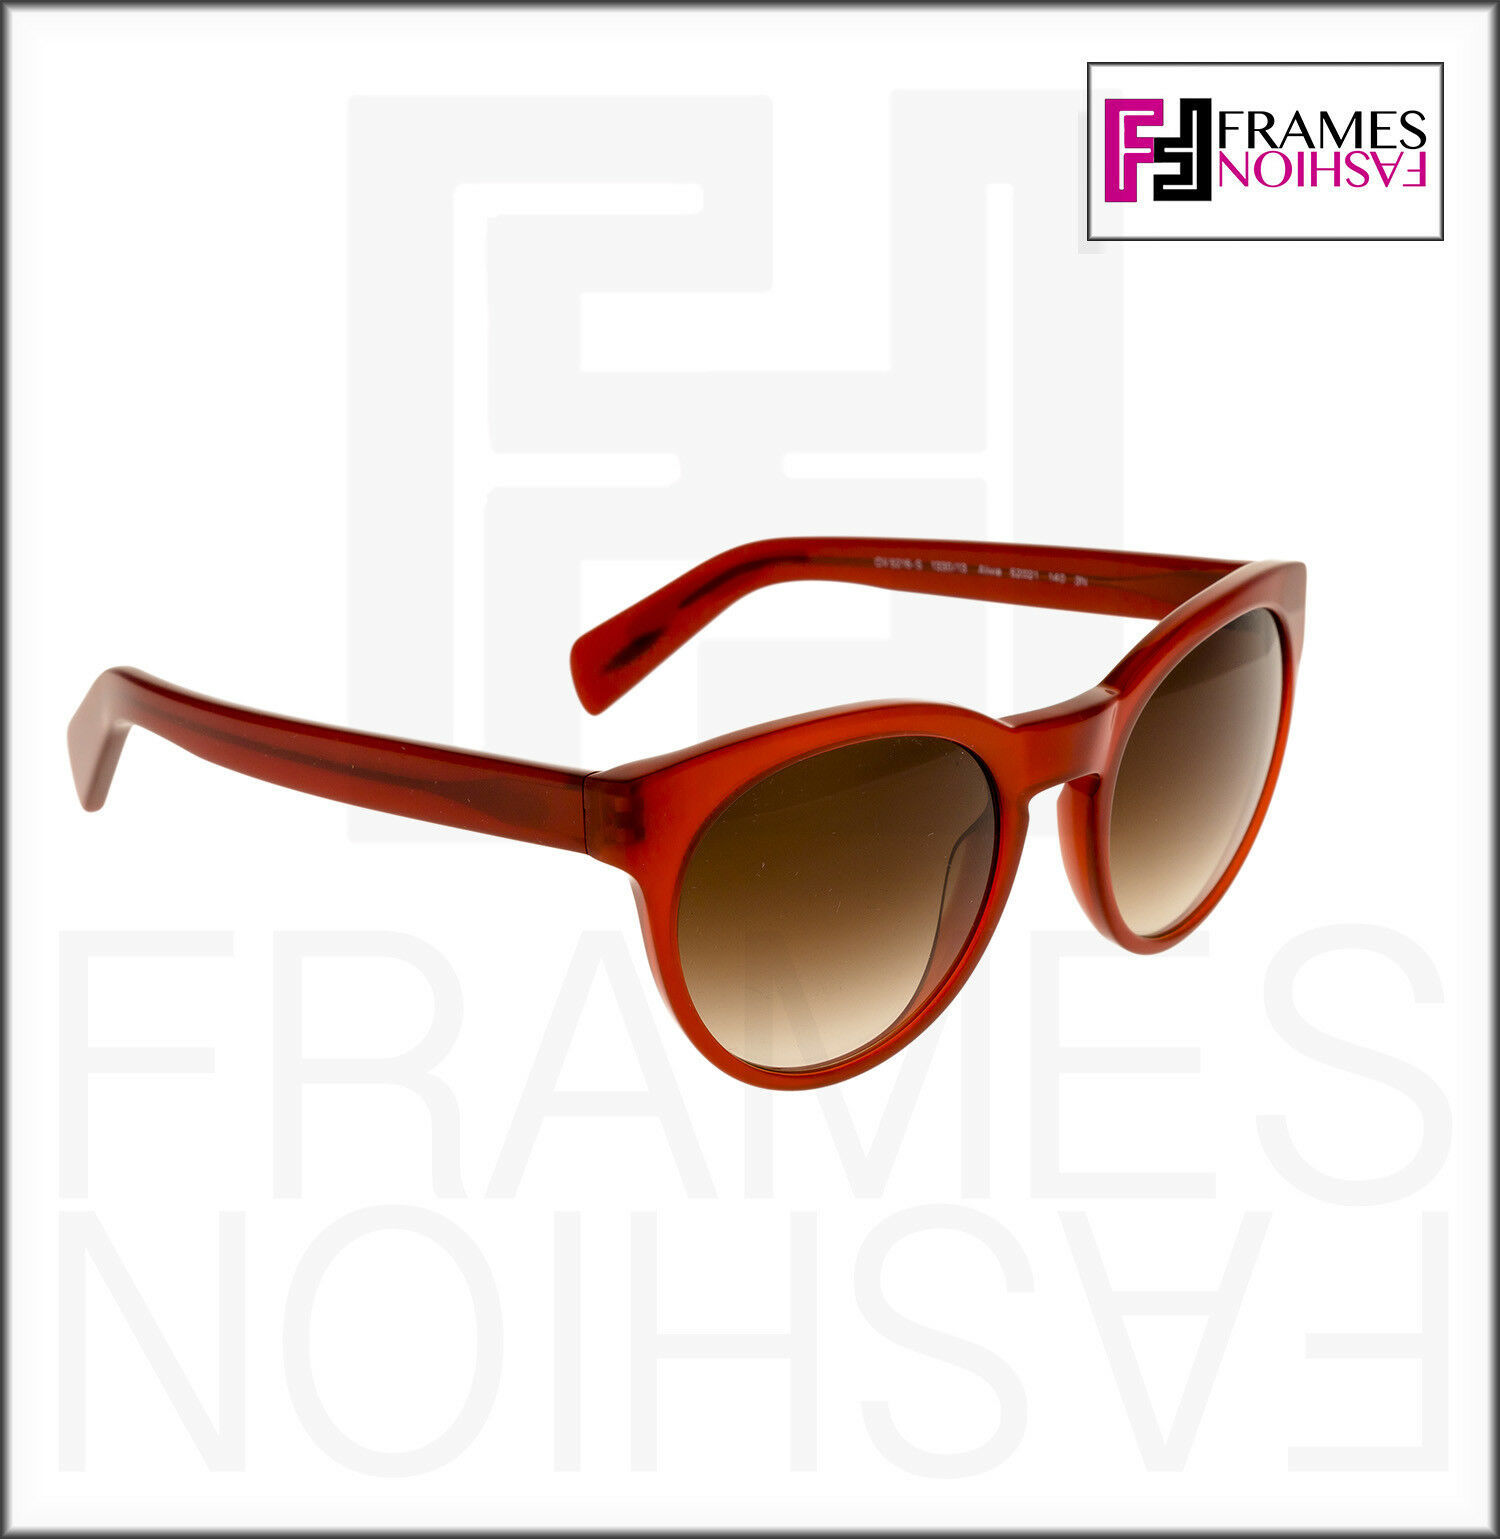 OLIVER PEOPLES ALIVIA OV5216S Red Blood Translucent Brown Round Sunglasses 5216 image 5